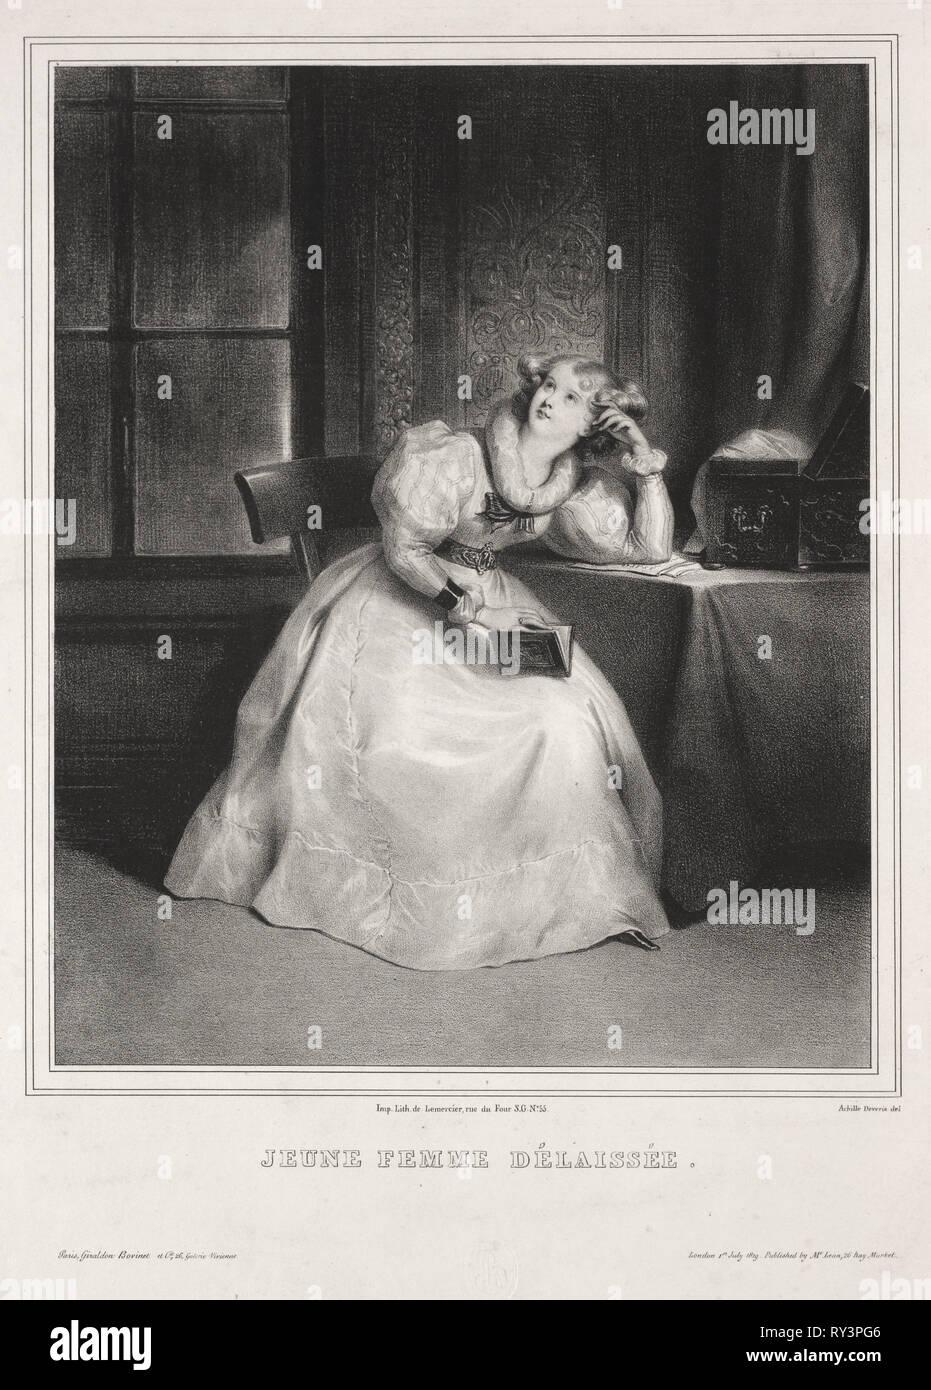 Reverie. Achille Devéria (French, 1800-1857). Lithograph - Stock Image